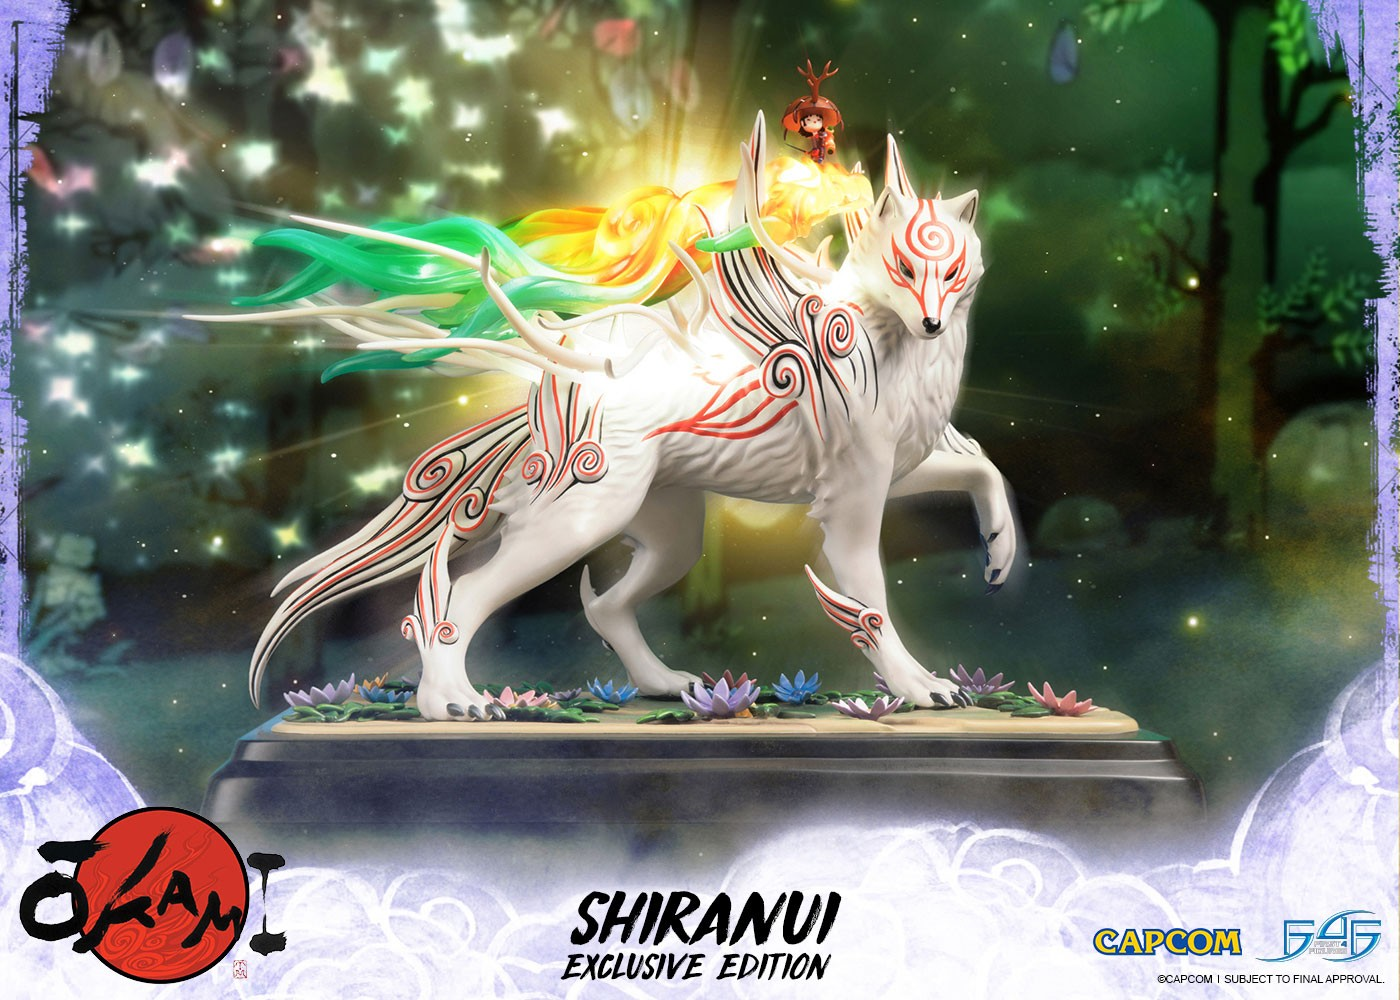 Shiranui (Exclusive)